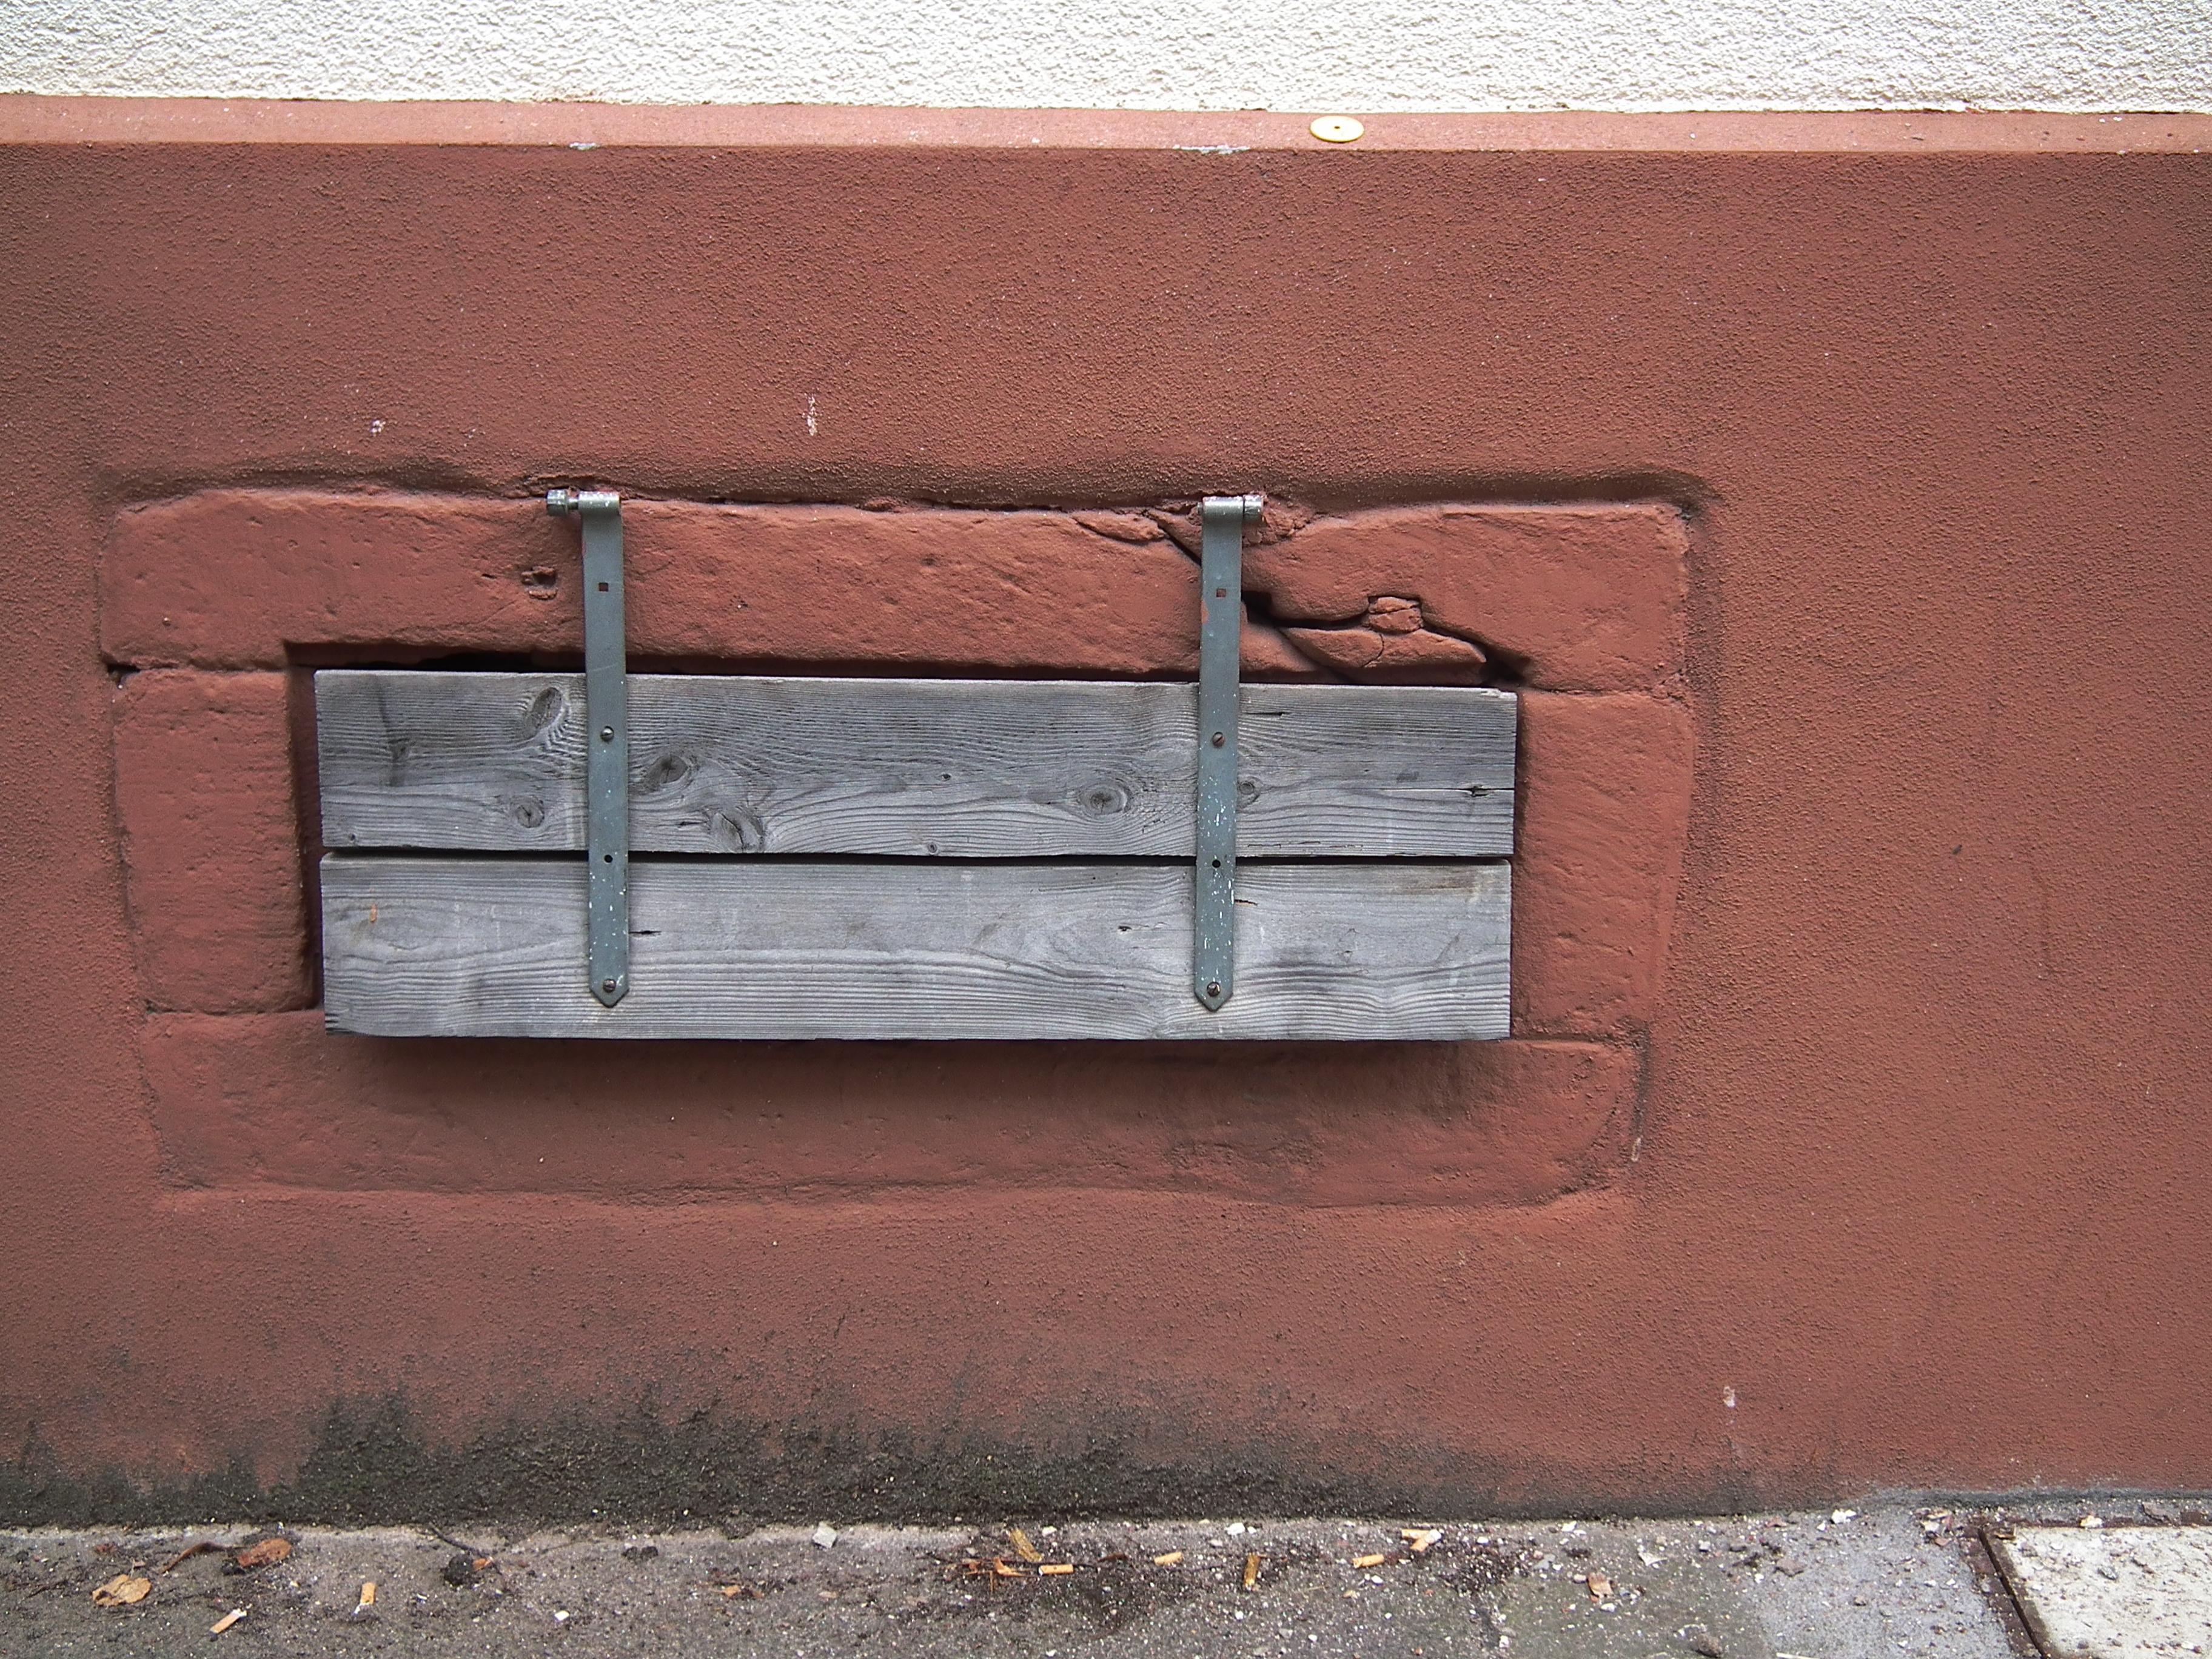 Keller fenster swalif - Kellerfenster mit katzenklappe ...